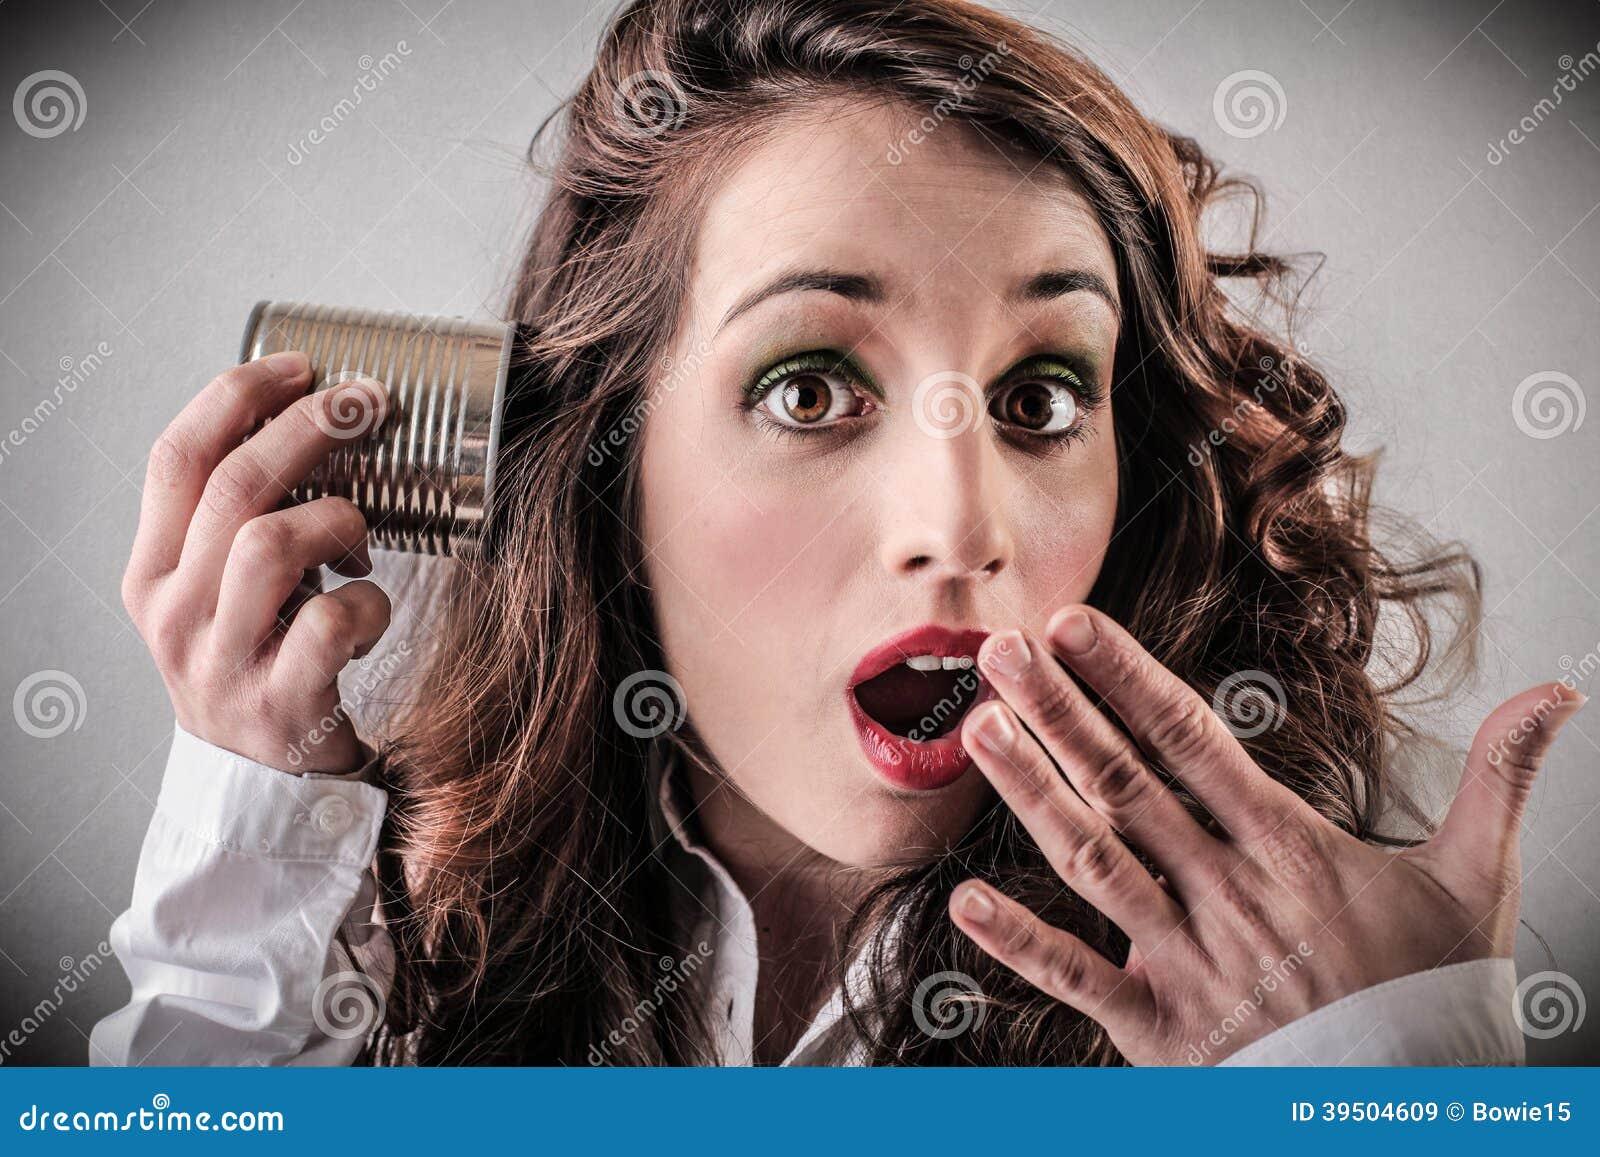 Surprised woman listening to something